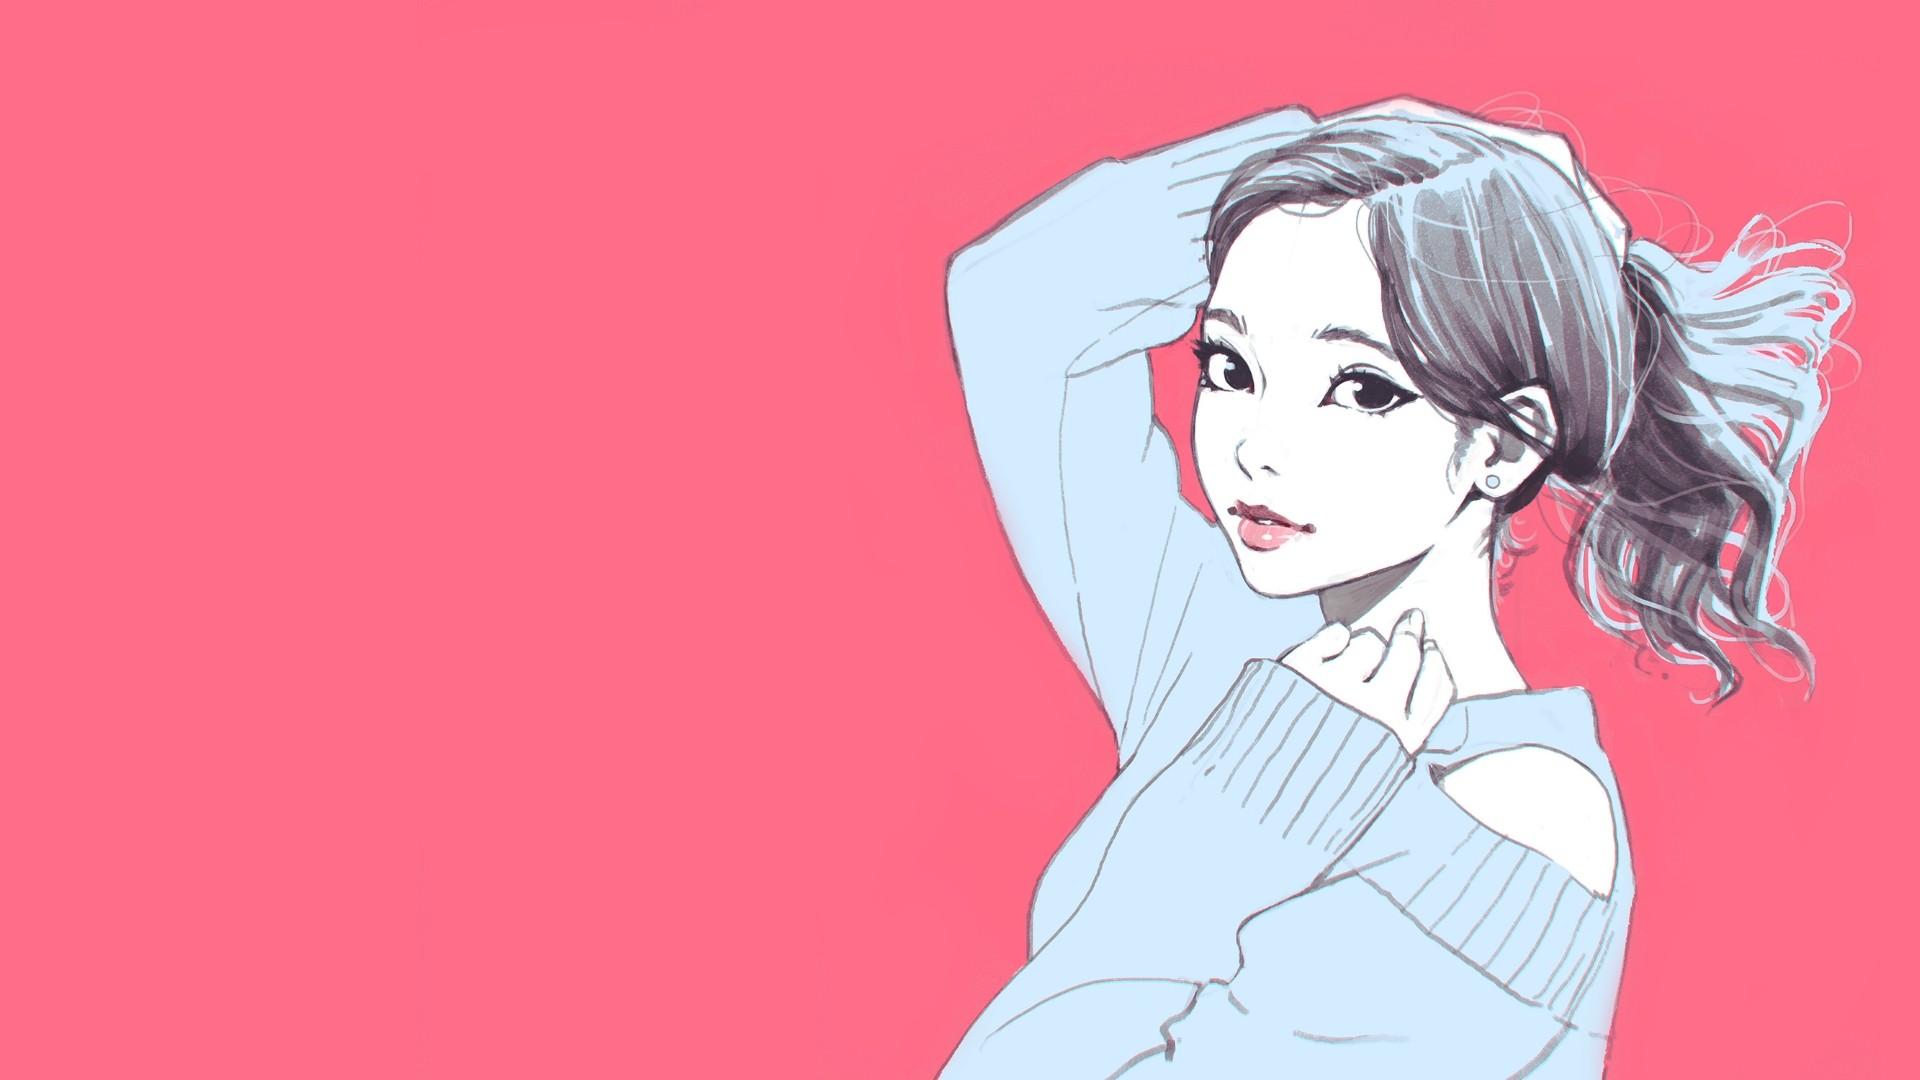 Wallpaper Face Drawing Digital Art Women Portrait Long Hair Anime Red Artwork Cartoon Black Hair Ilya Kuvshinov Mouth Nose Pink Emotion Happiness Skin Head Joint Art Cool Girl Beauty Smile Woman